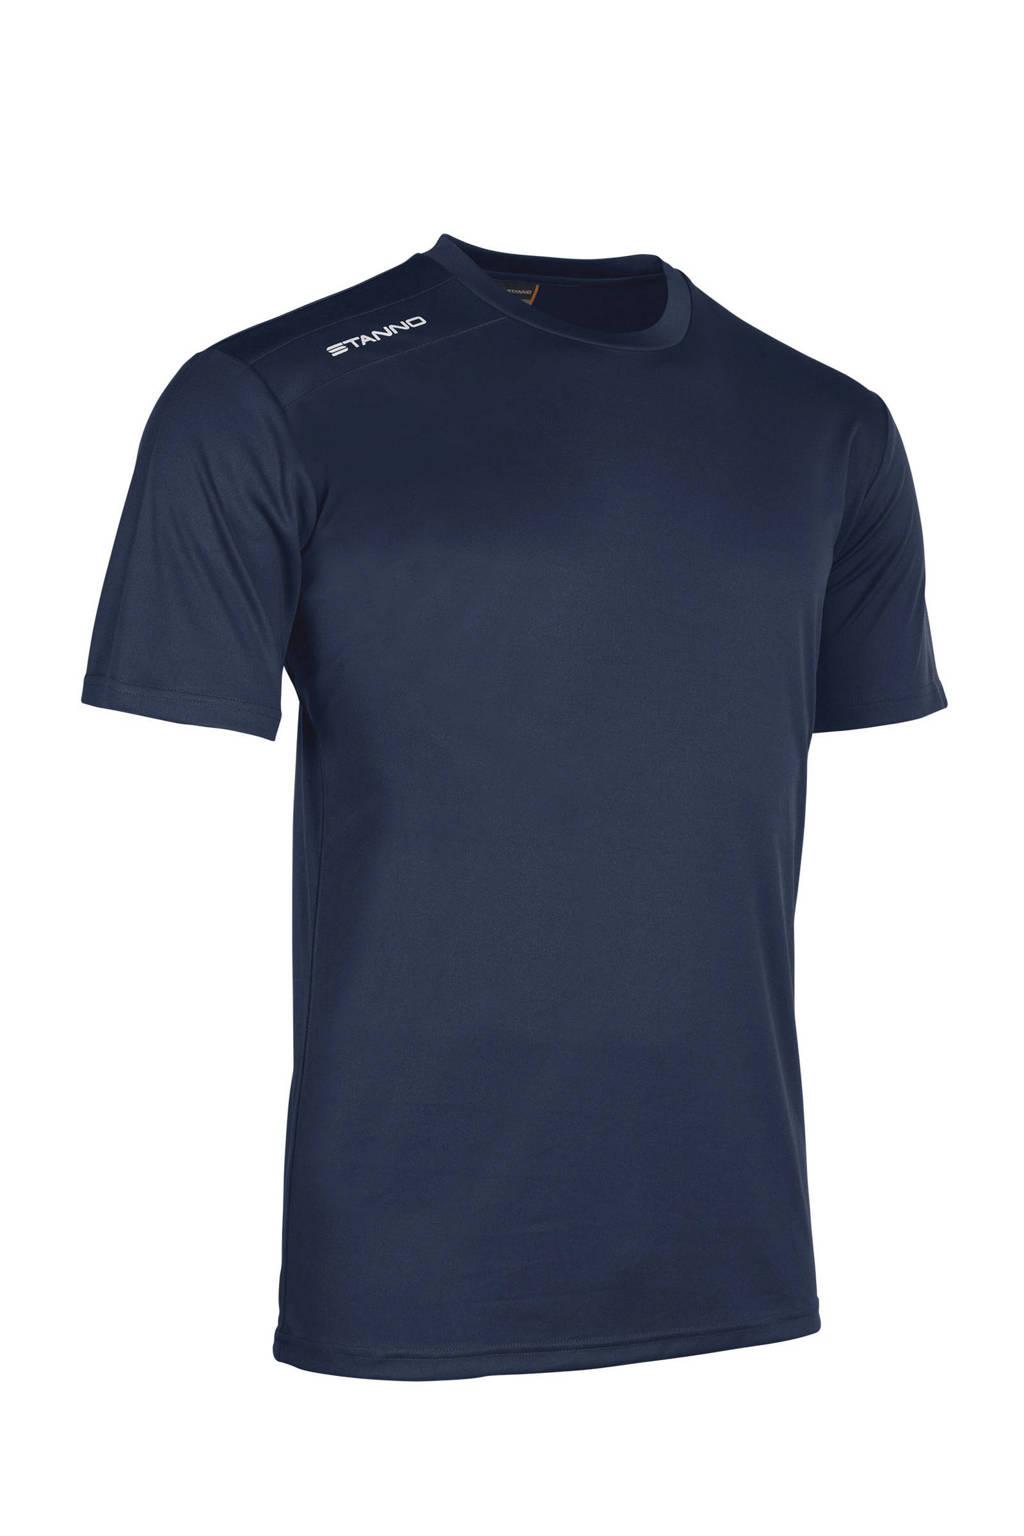 Stanno Junior  sport T-shirt donkerblauw, Donkerblauw